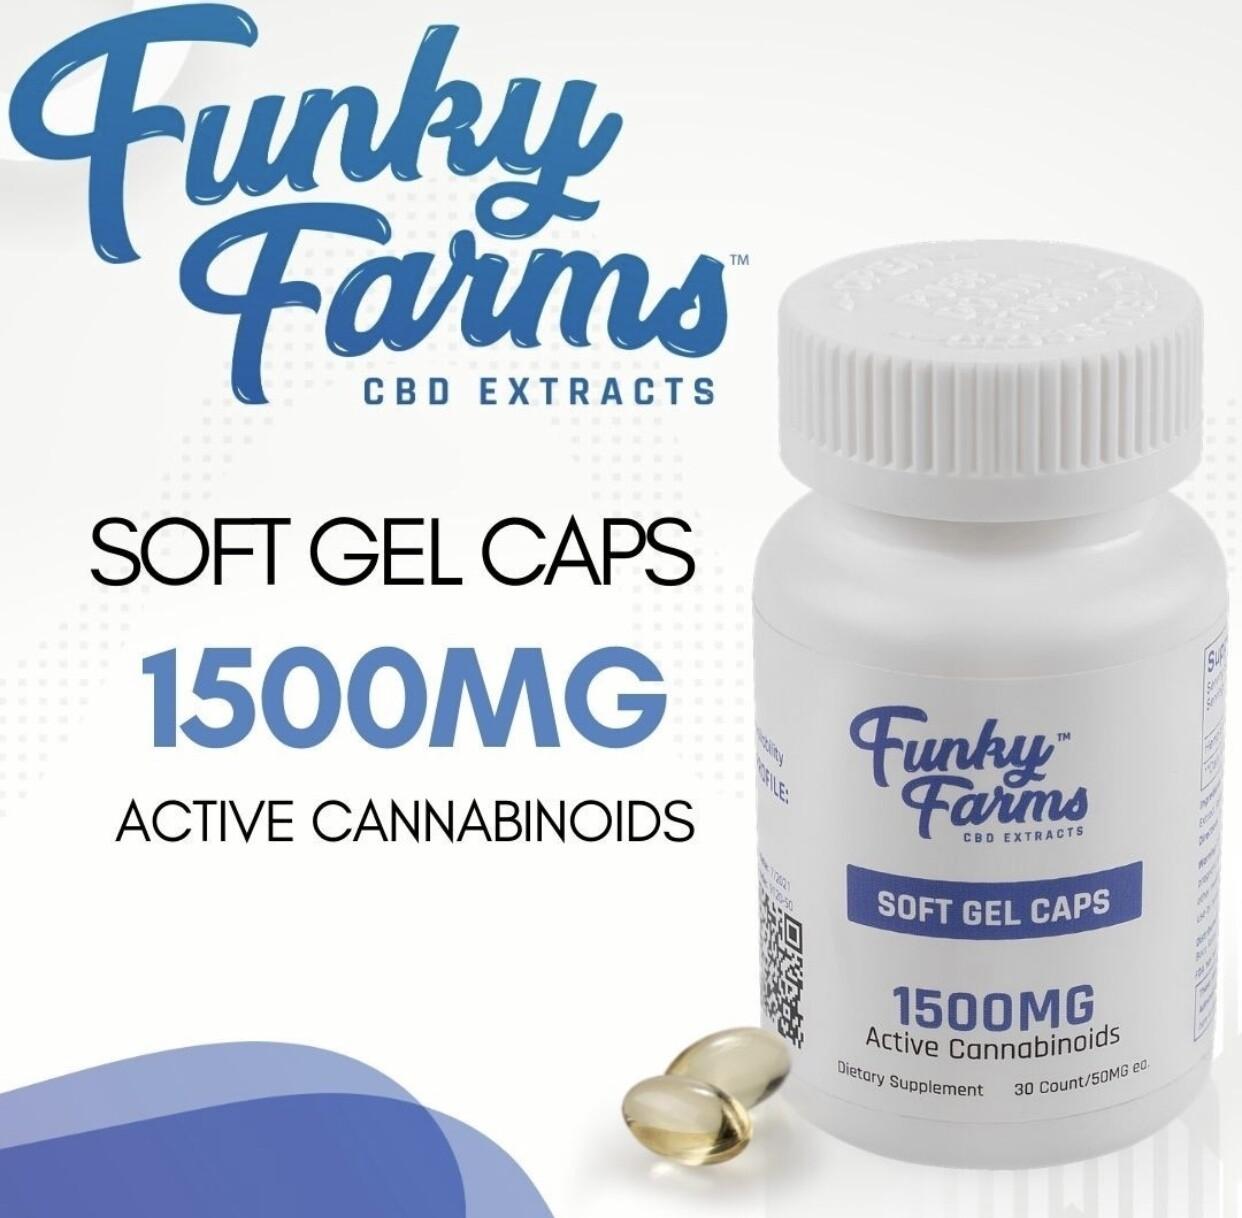 Funky Farms 1500 mg Soft Gels